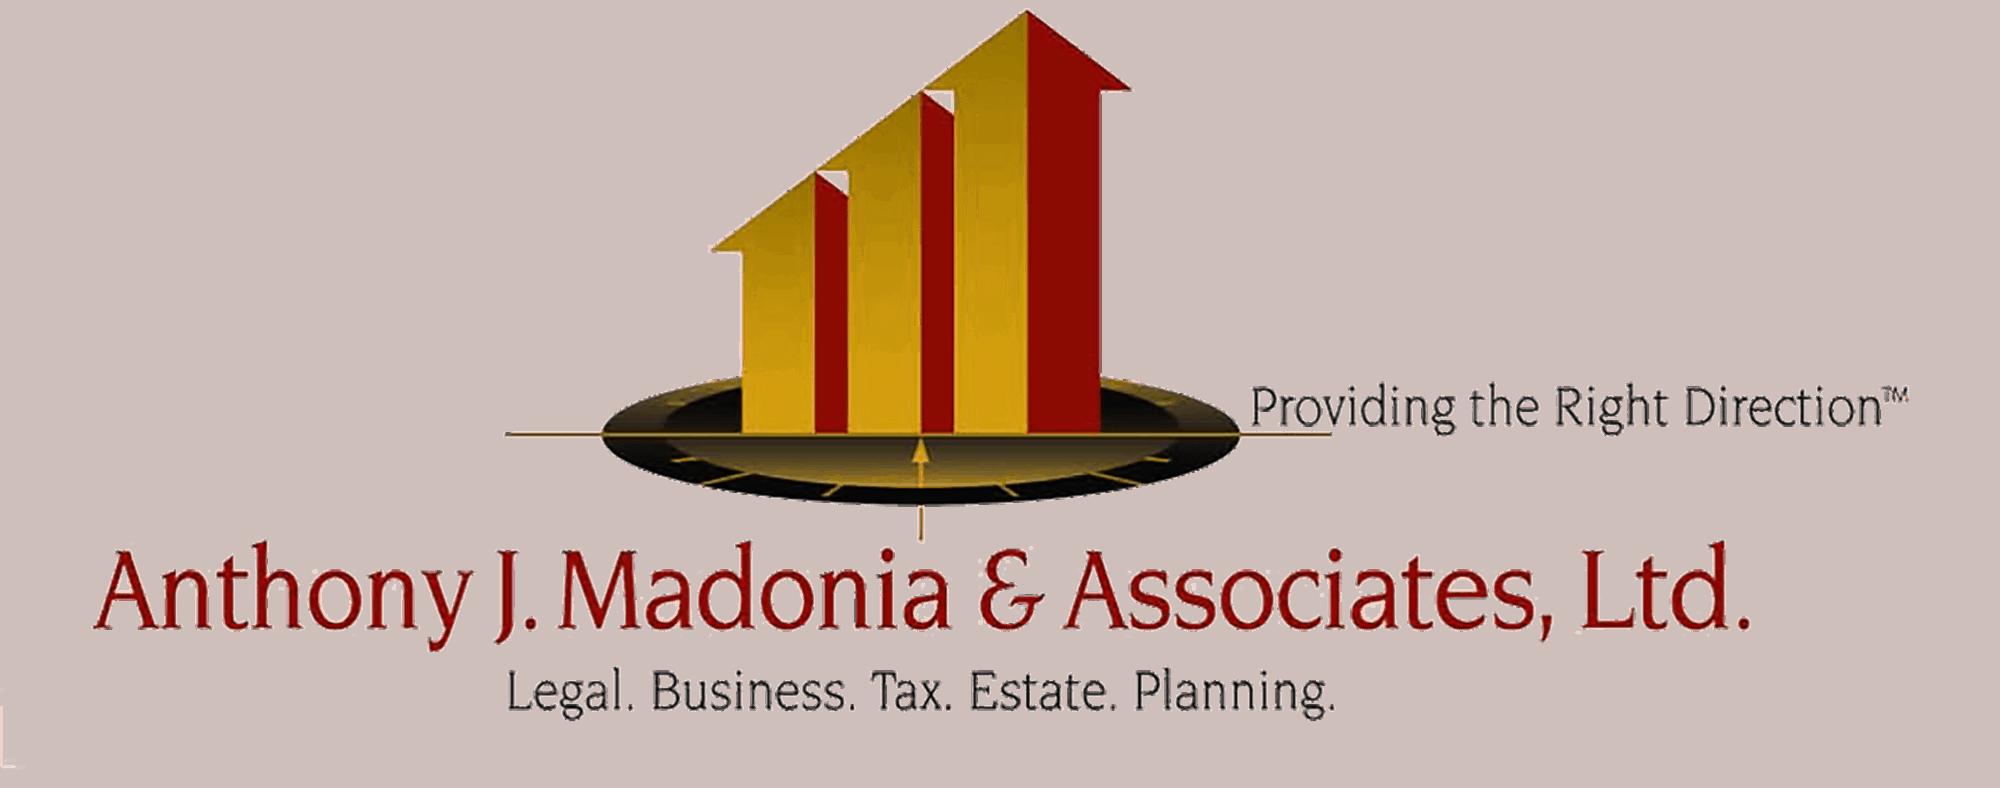 Anthony J. Madonia & Associates, Ltd.